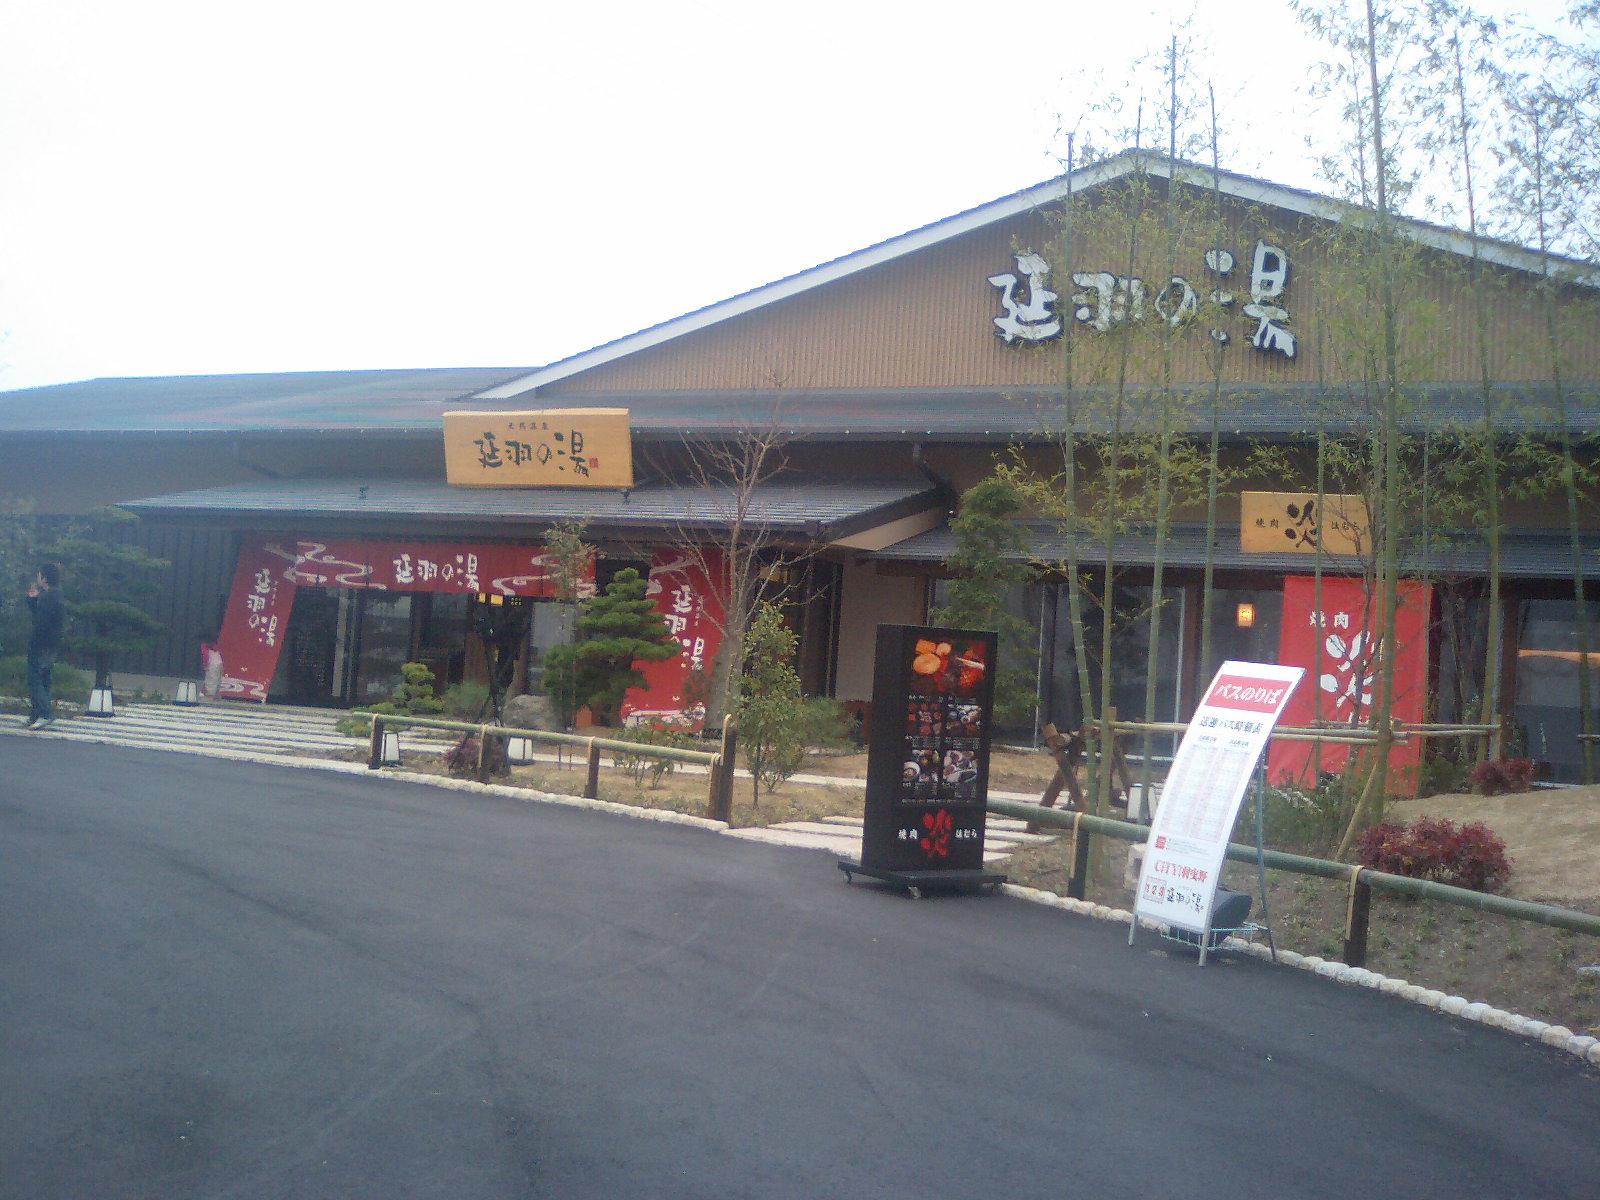 http://livedoor.blogimg.jp/finely/imgs/5/b/5bd34649.JPG